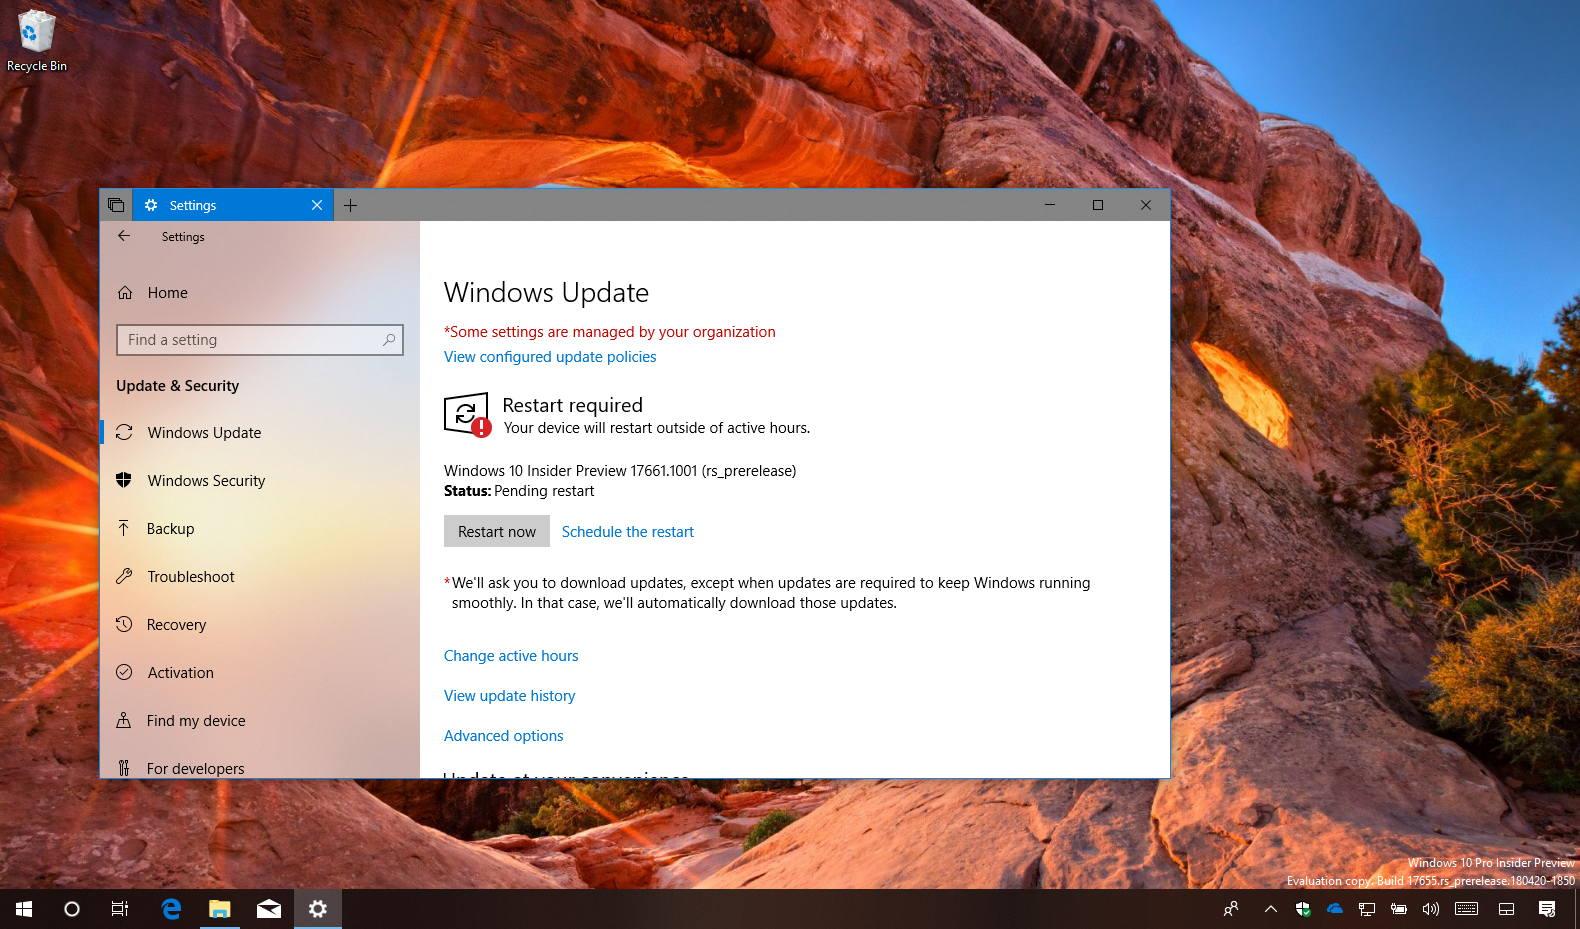 Windows 10 build 17661